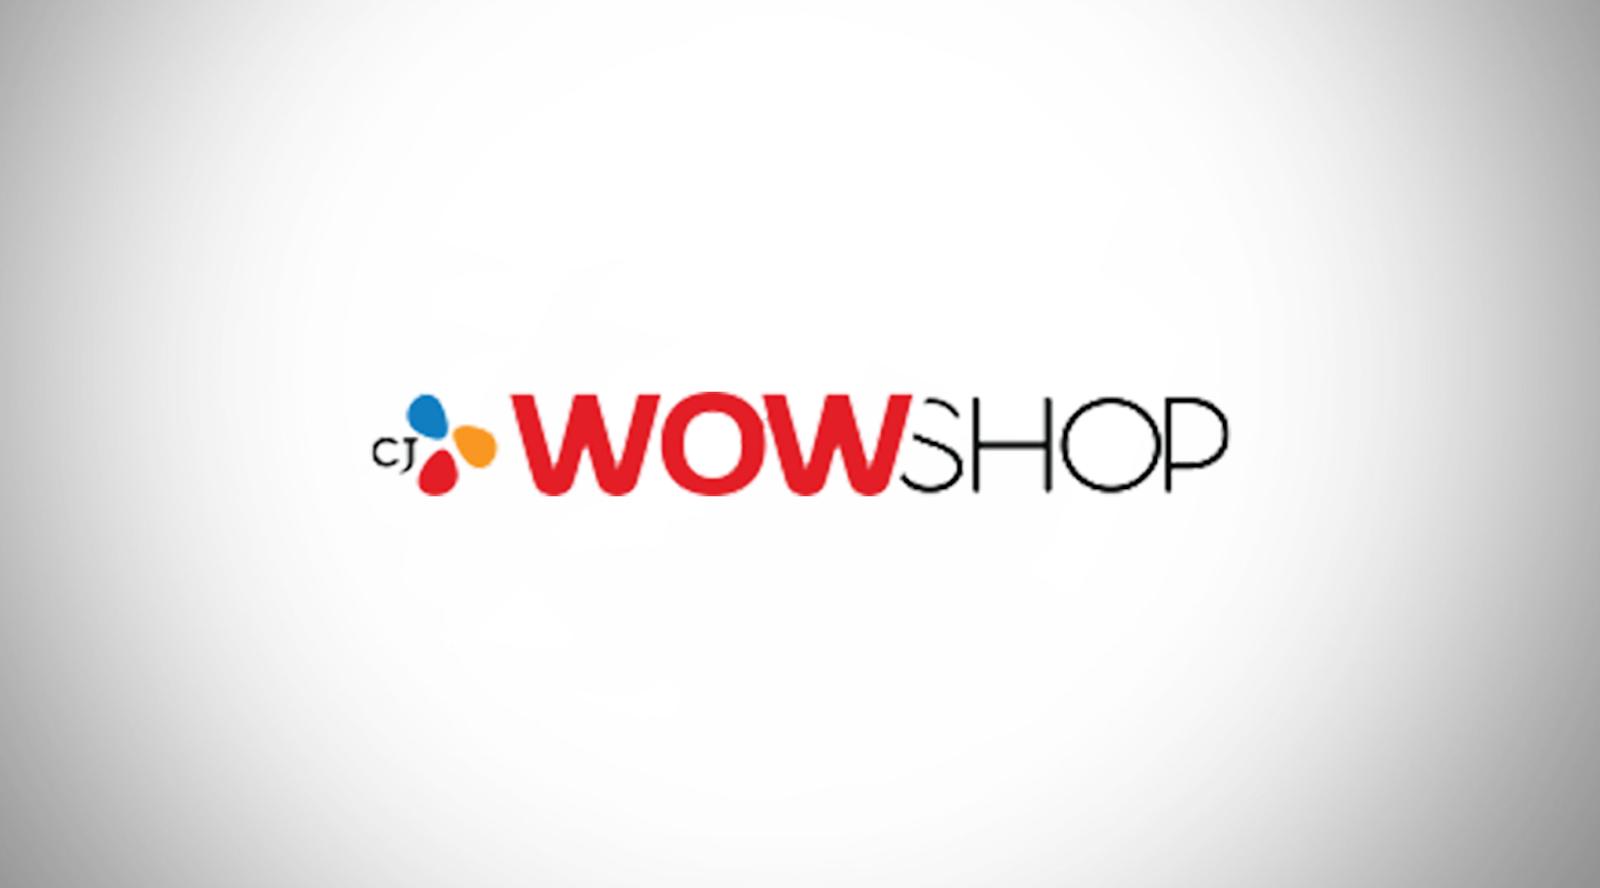 CJ Wow Shop Malaysia Live Streaming